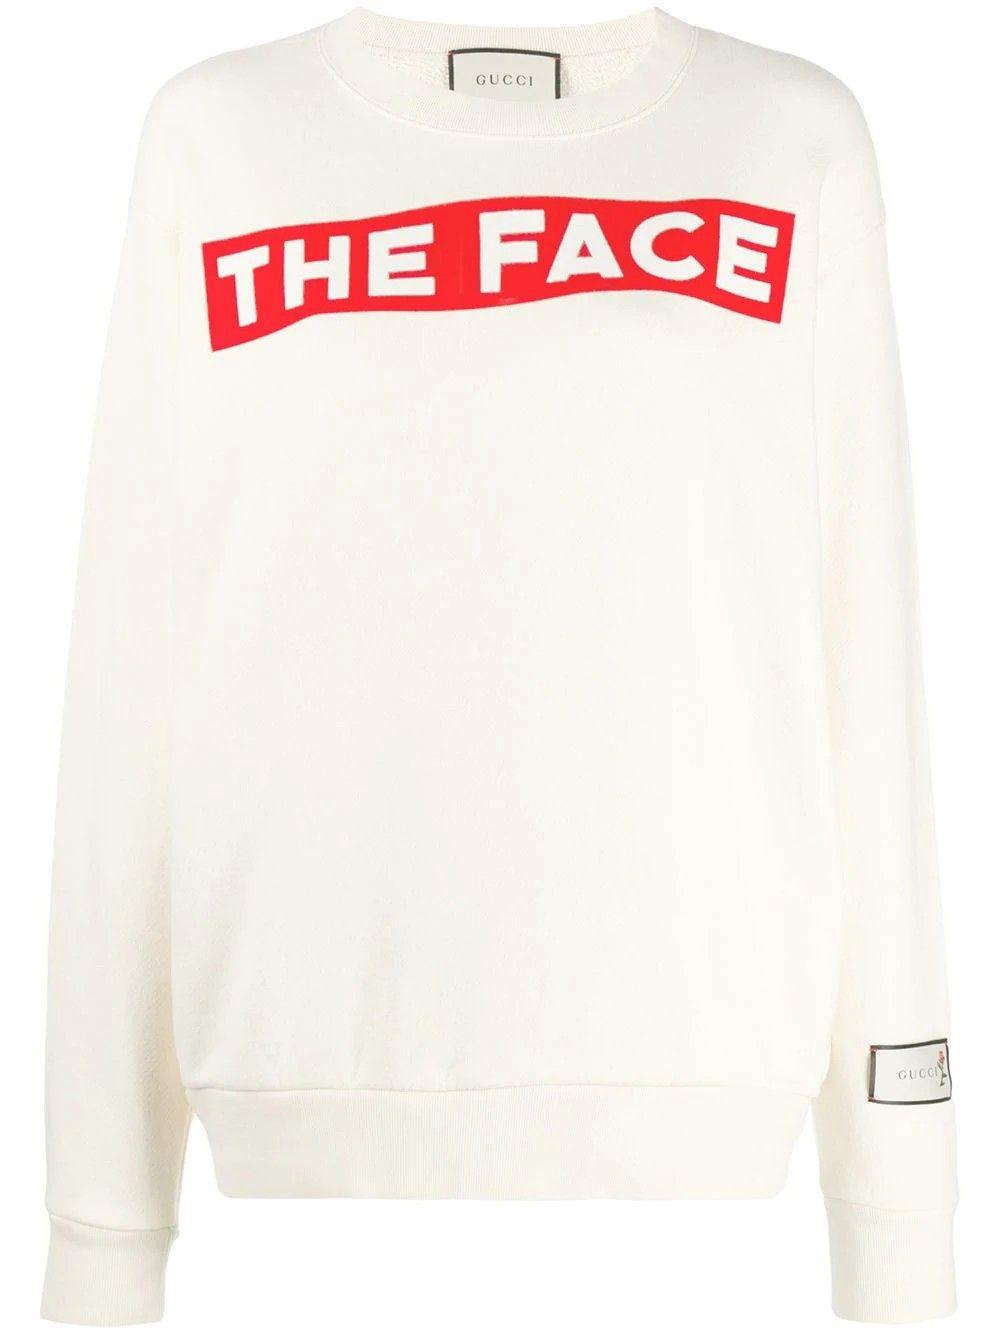 Gucci The Face Print Sweatshirt En 2021 Ropa [ 1334 x 1000 Pixel ]